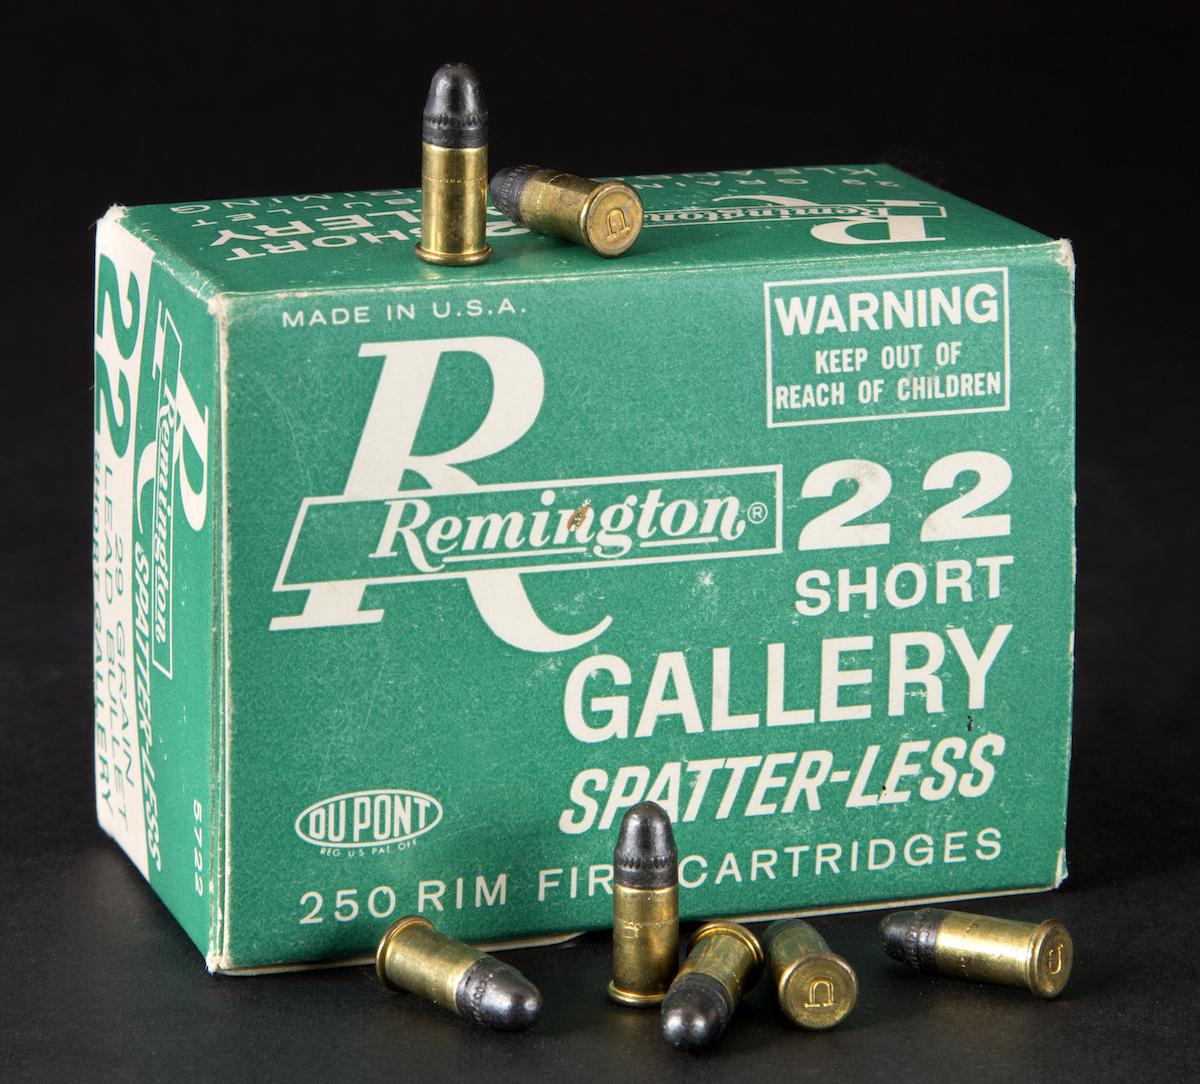 Box of Remington .22 Short Cartridges.